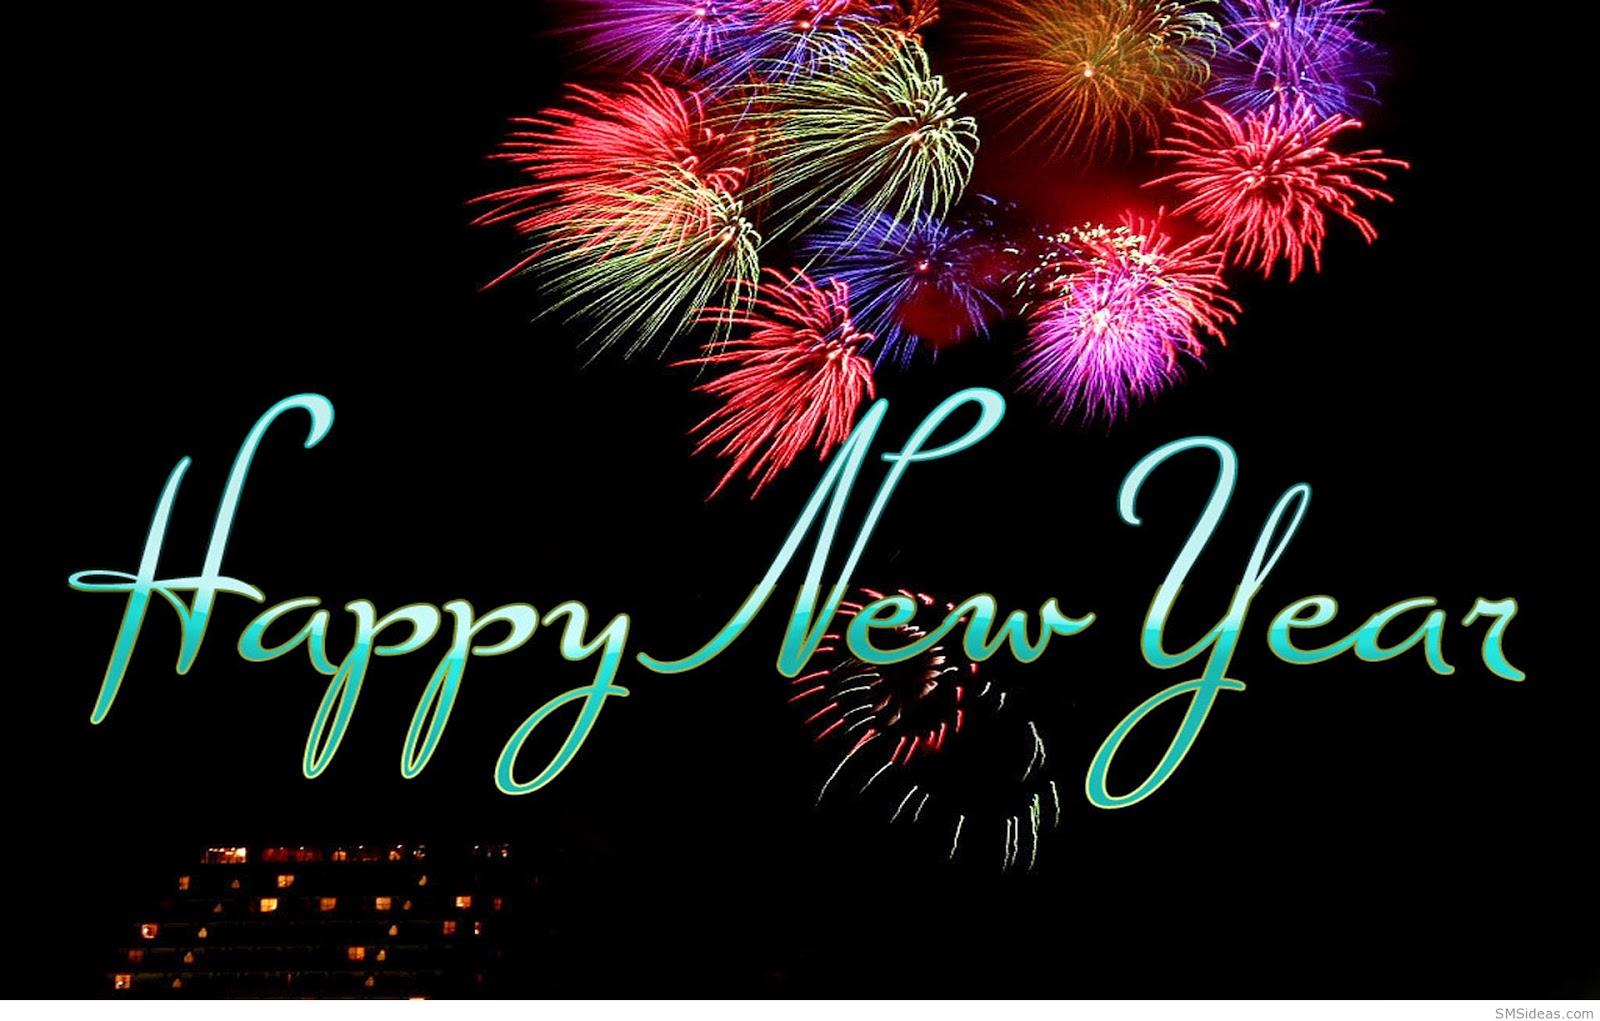 Happy-new-year-photo-2016-greetings-images-photos-sensongspk